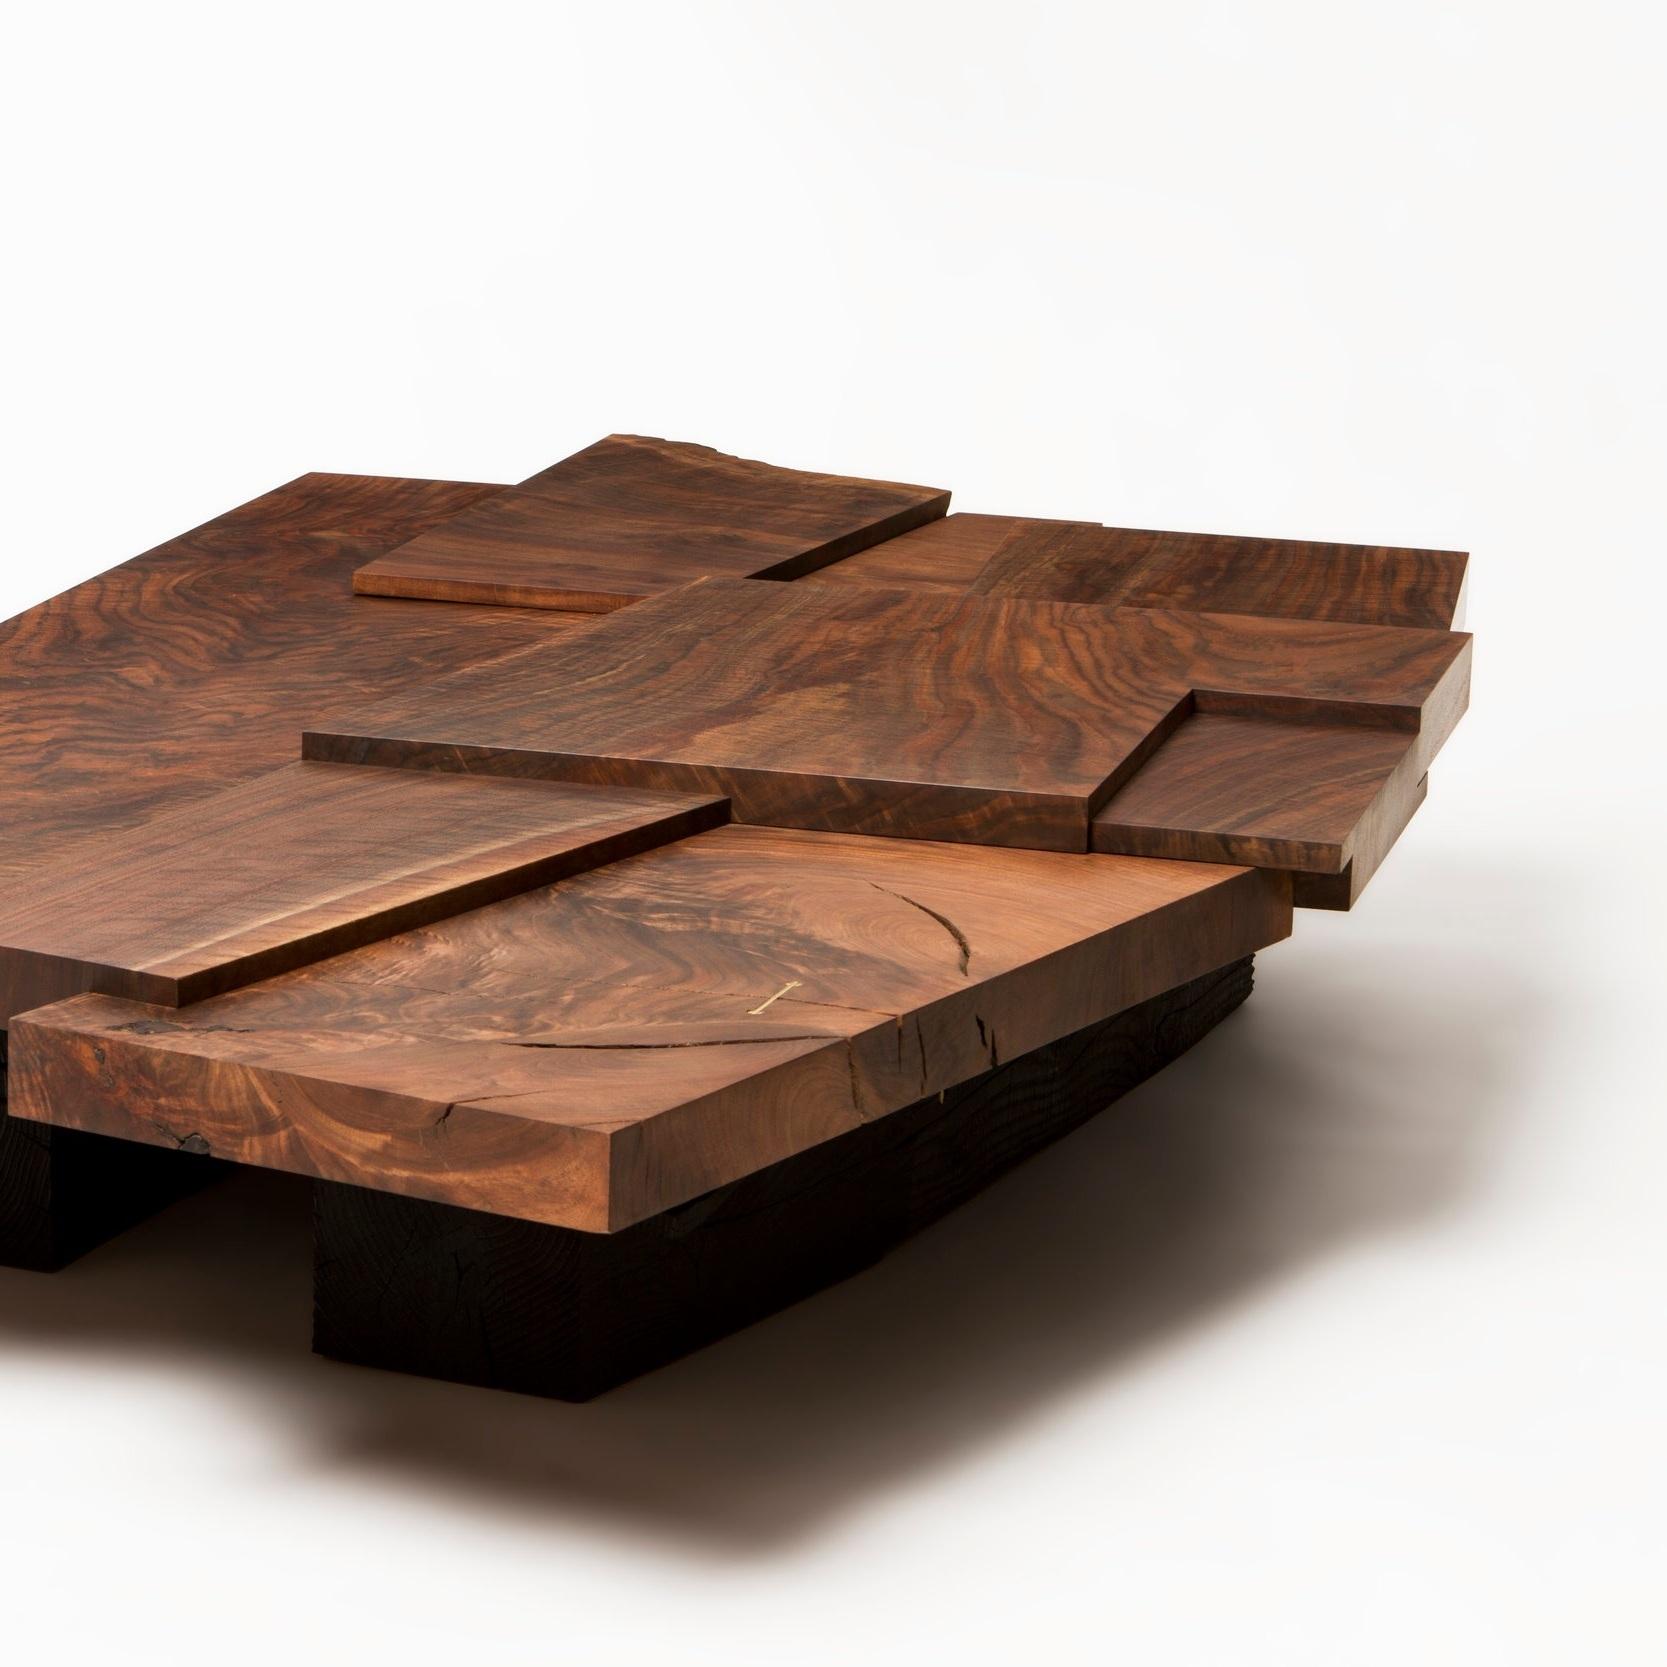 Furniture / Strike/slip table